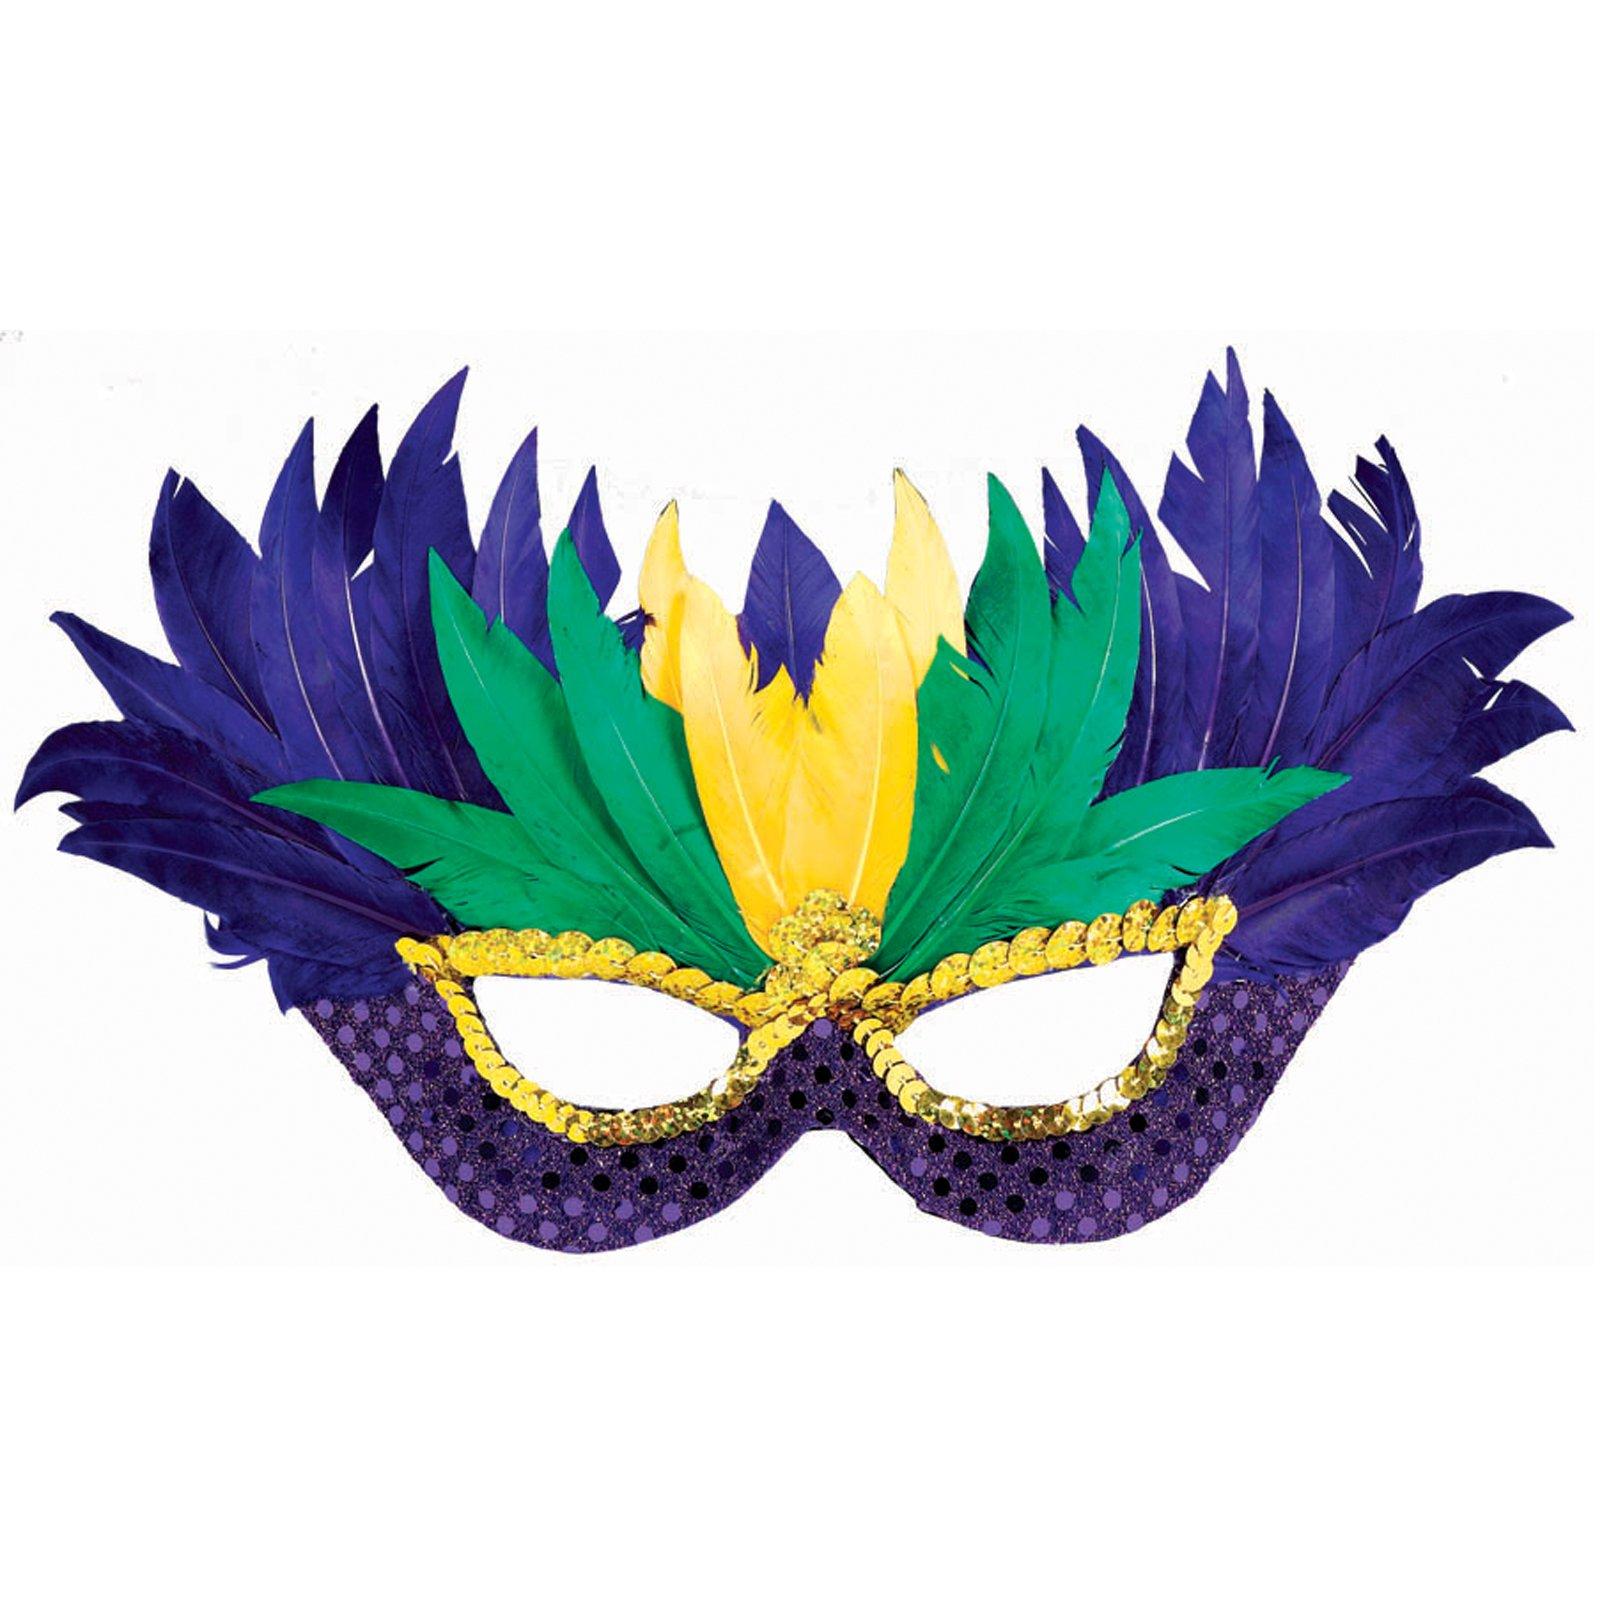 1600x1600 Mardi Gras Mask Stock Vector 71894632 Shutterstock